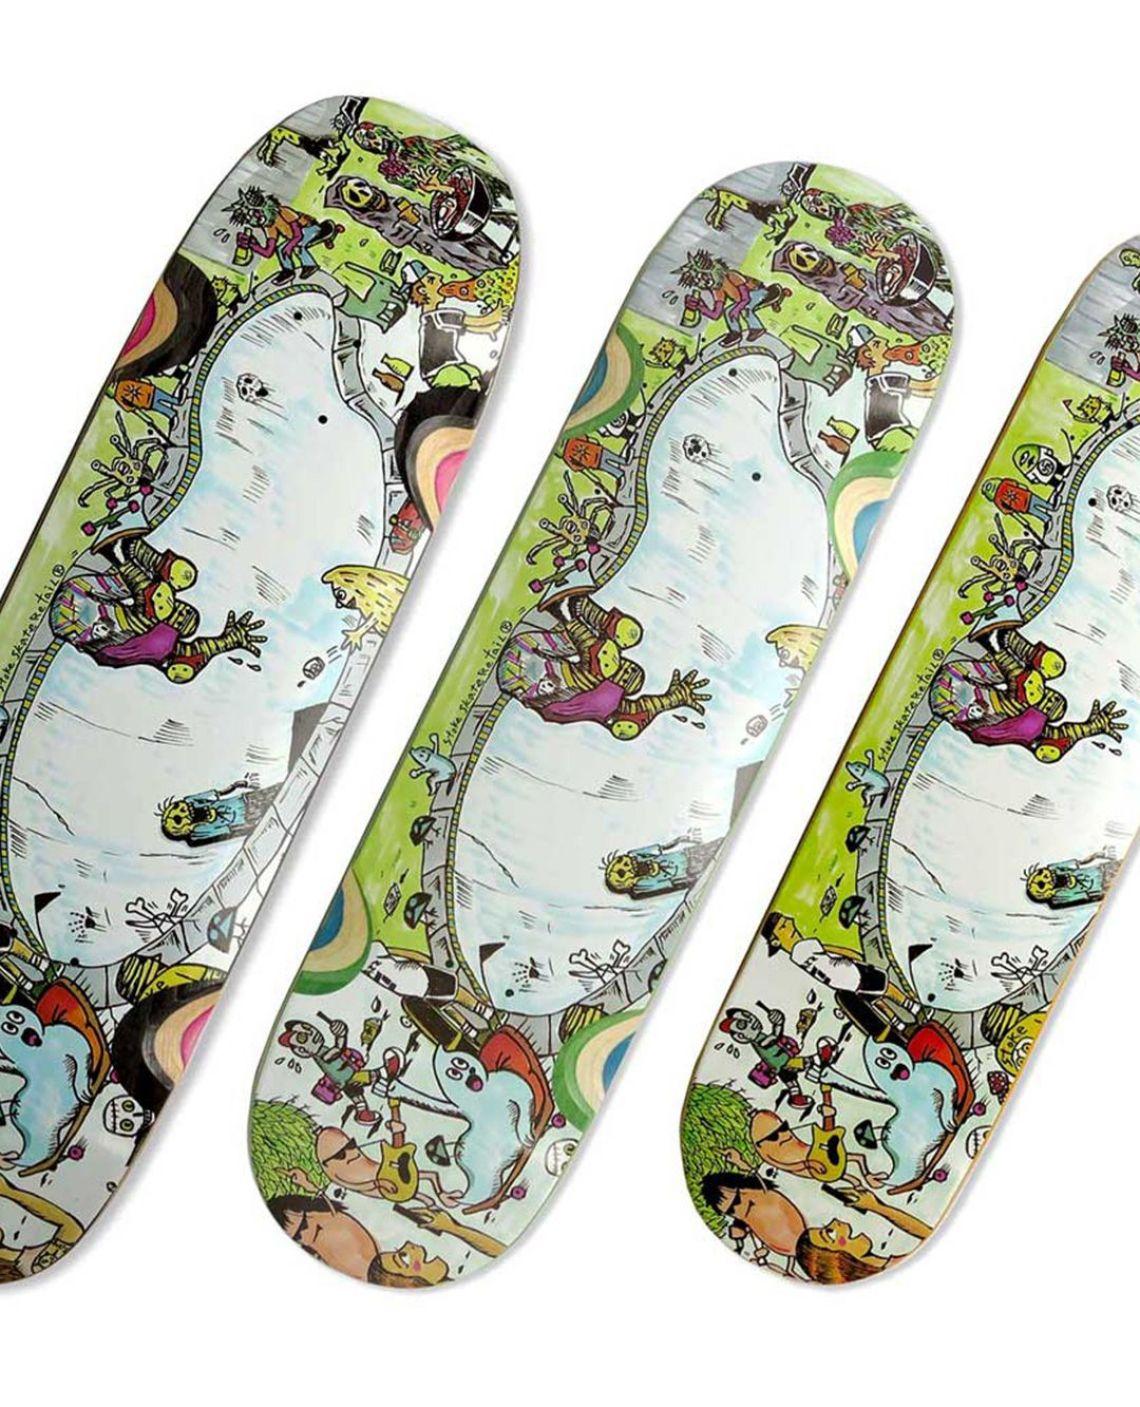 Stoke Backyard Hell By Kenji 373 For Stoke Skate Retail 3